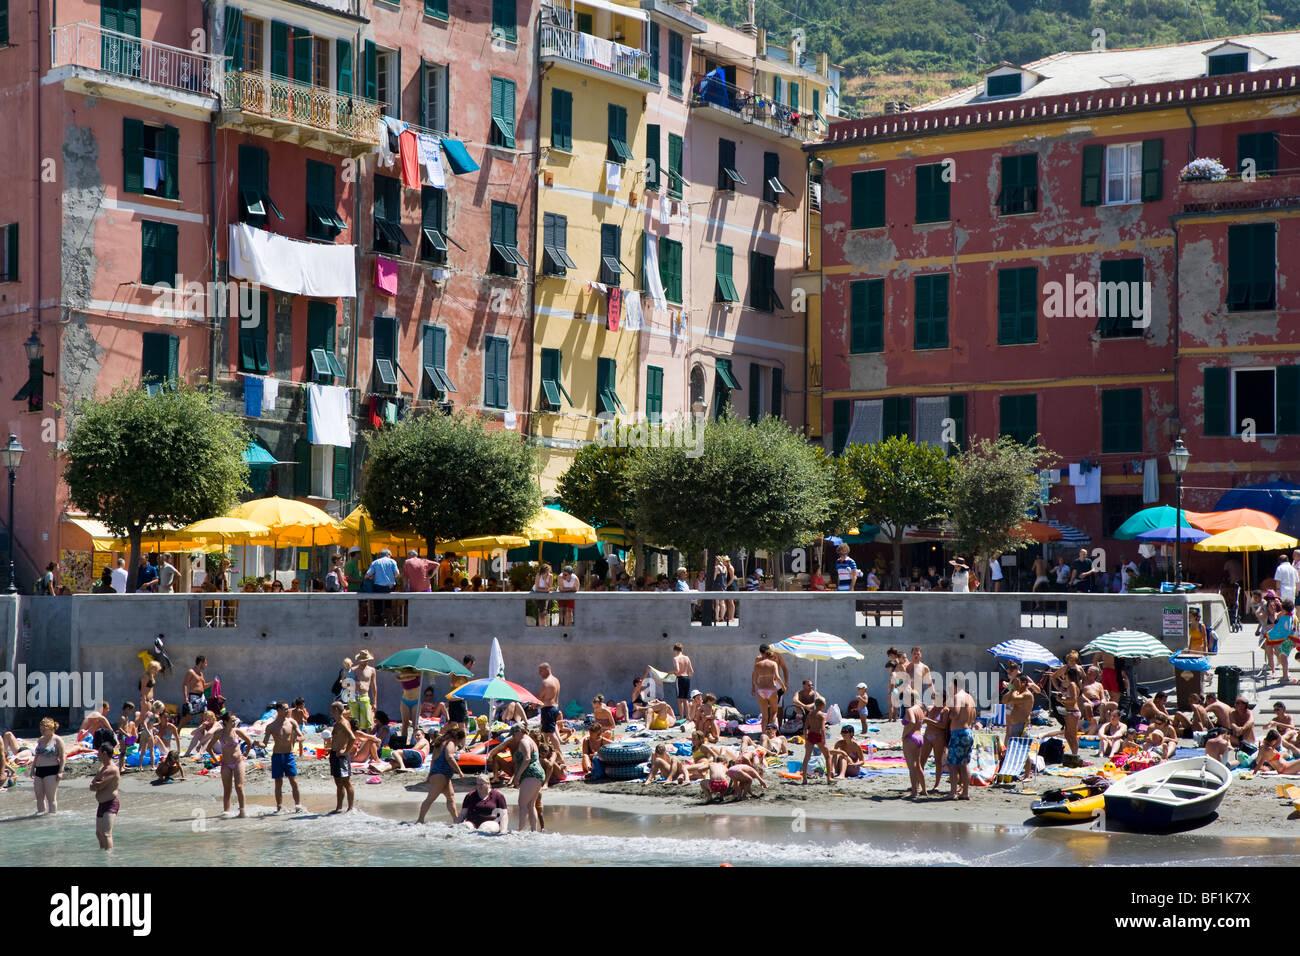 Vernazza beach and town, Cinque Terre, Liguria, Italy - Stock Image